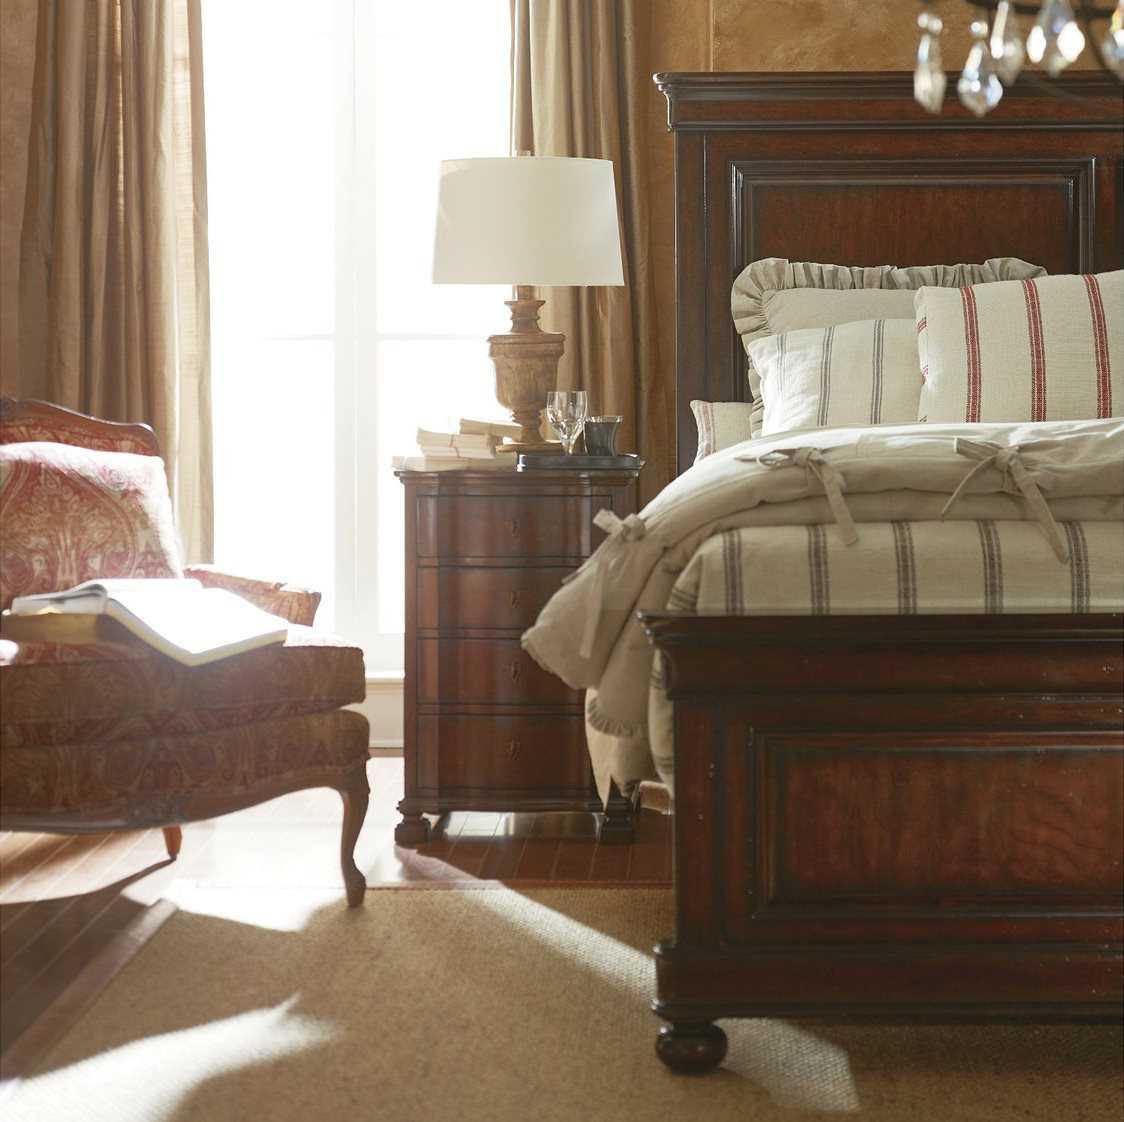 Stanley furniture louis philippe bedroom set sl0581340set2 - Louis philippe bedroom collection ...